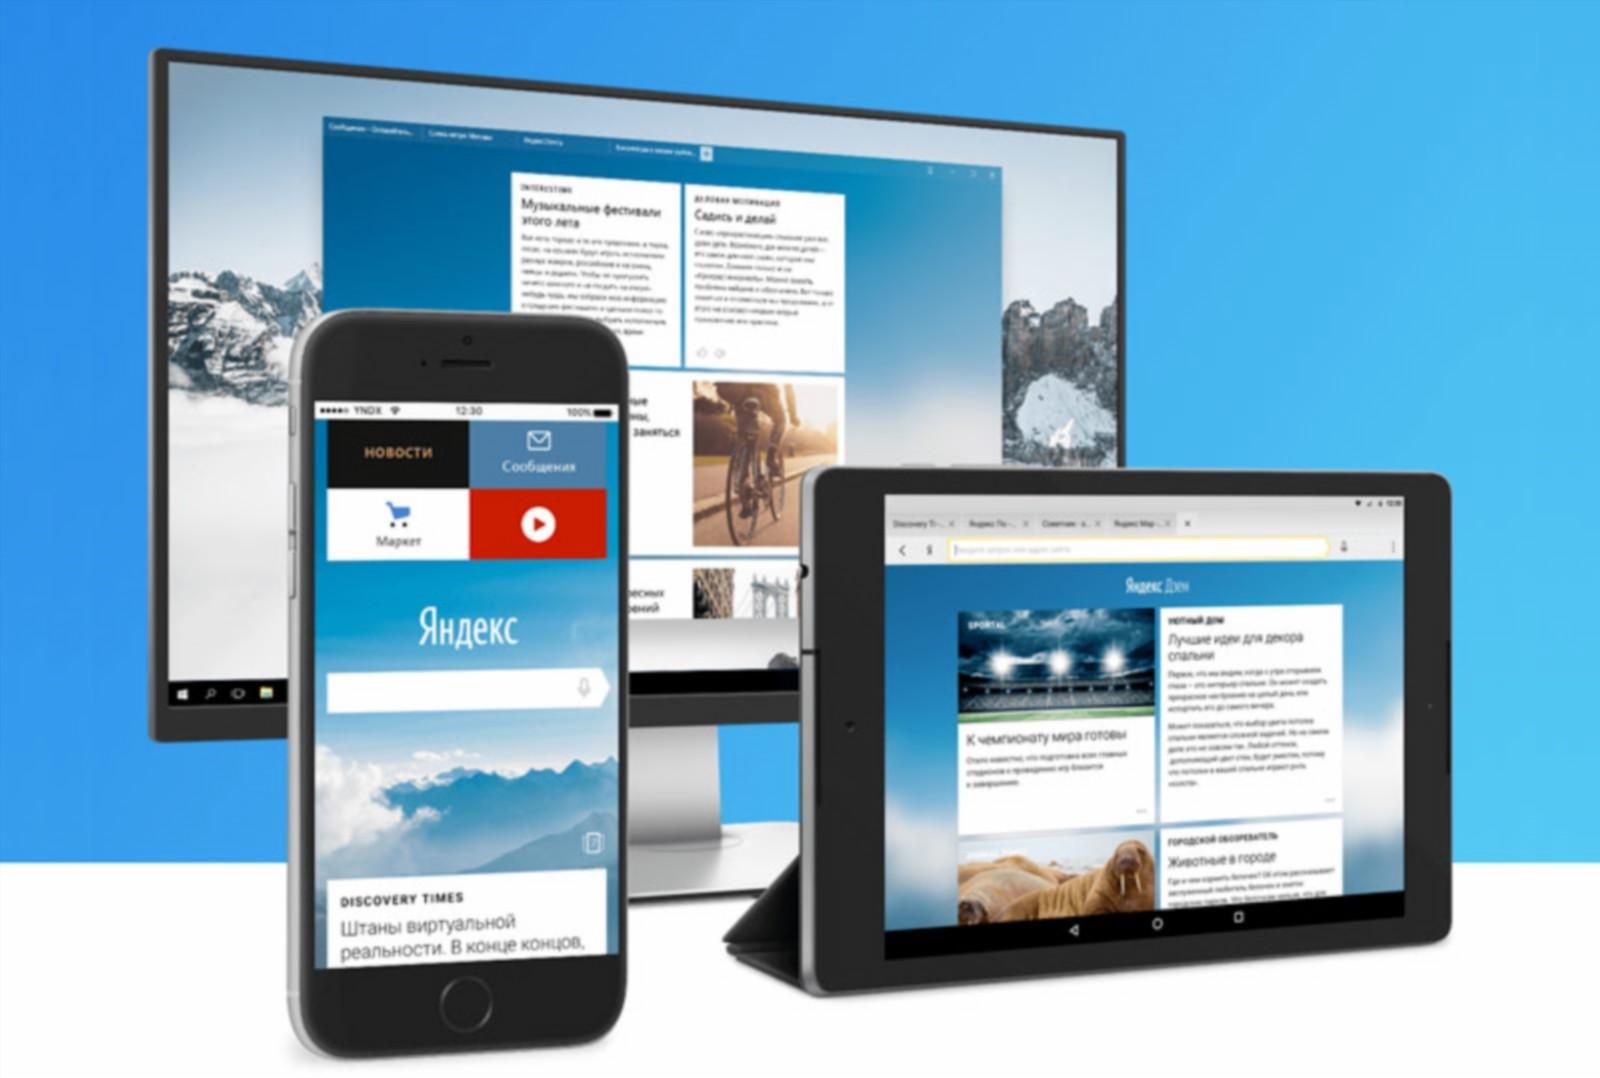 Яндекс.Дзен сейчас доступен на андроид